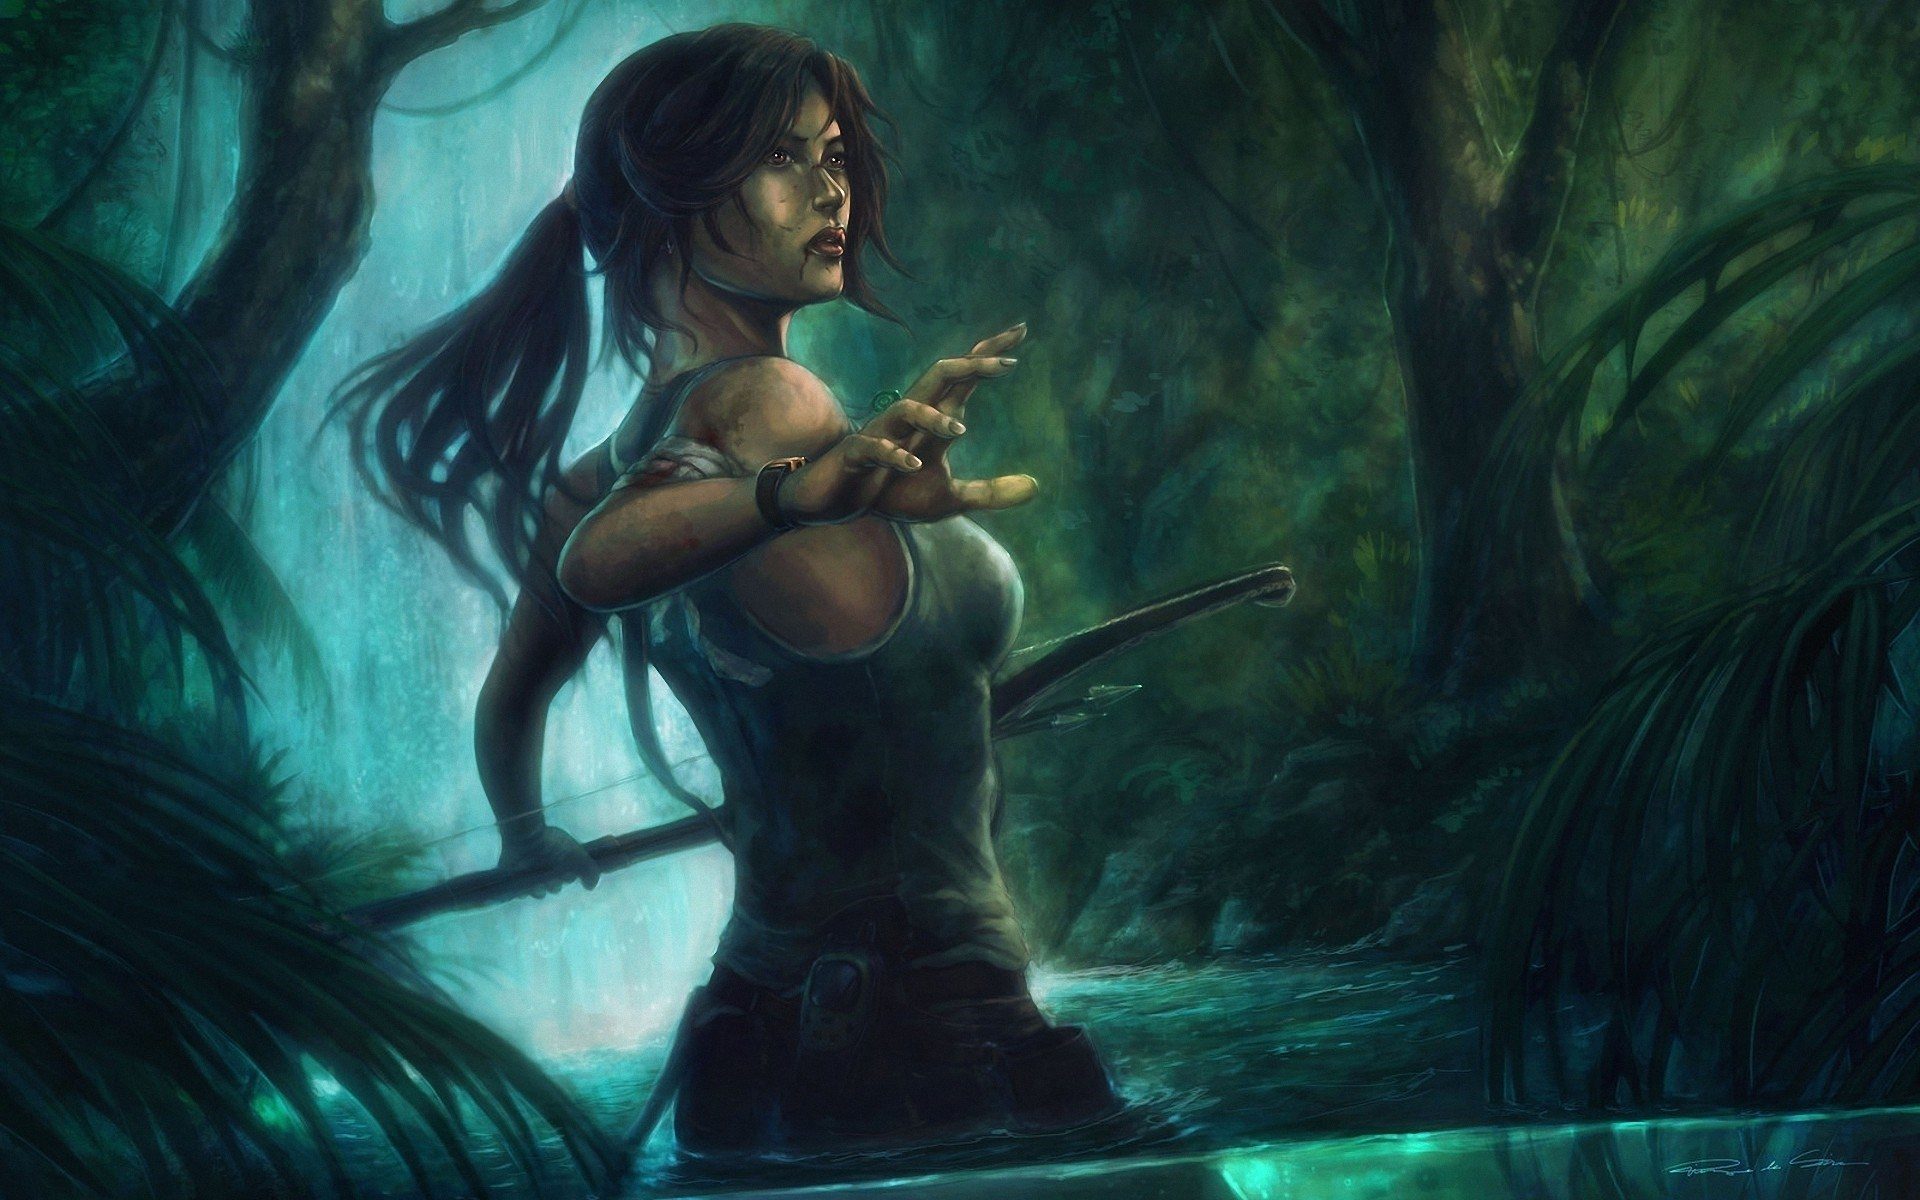 Art Tomb Raider Lara Croft Girl Jungle